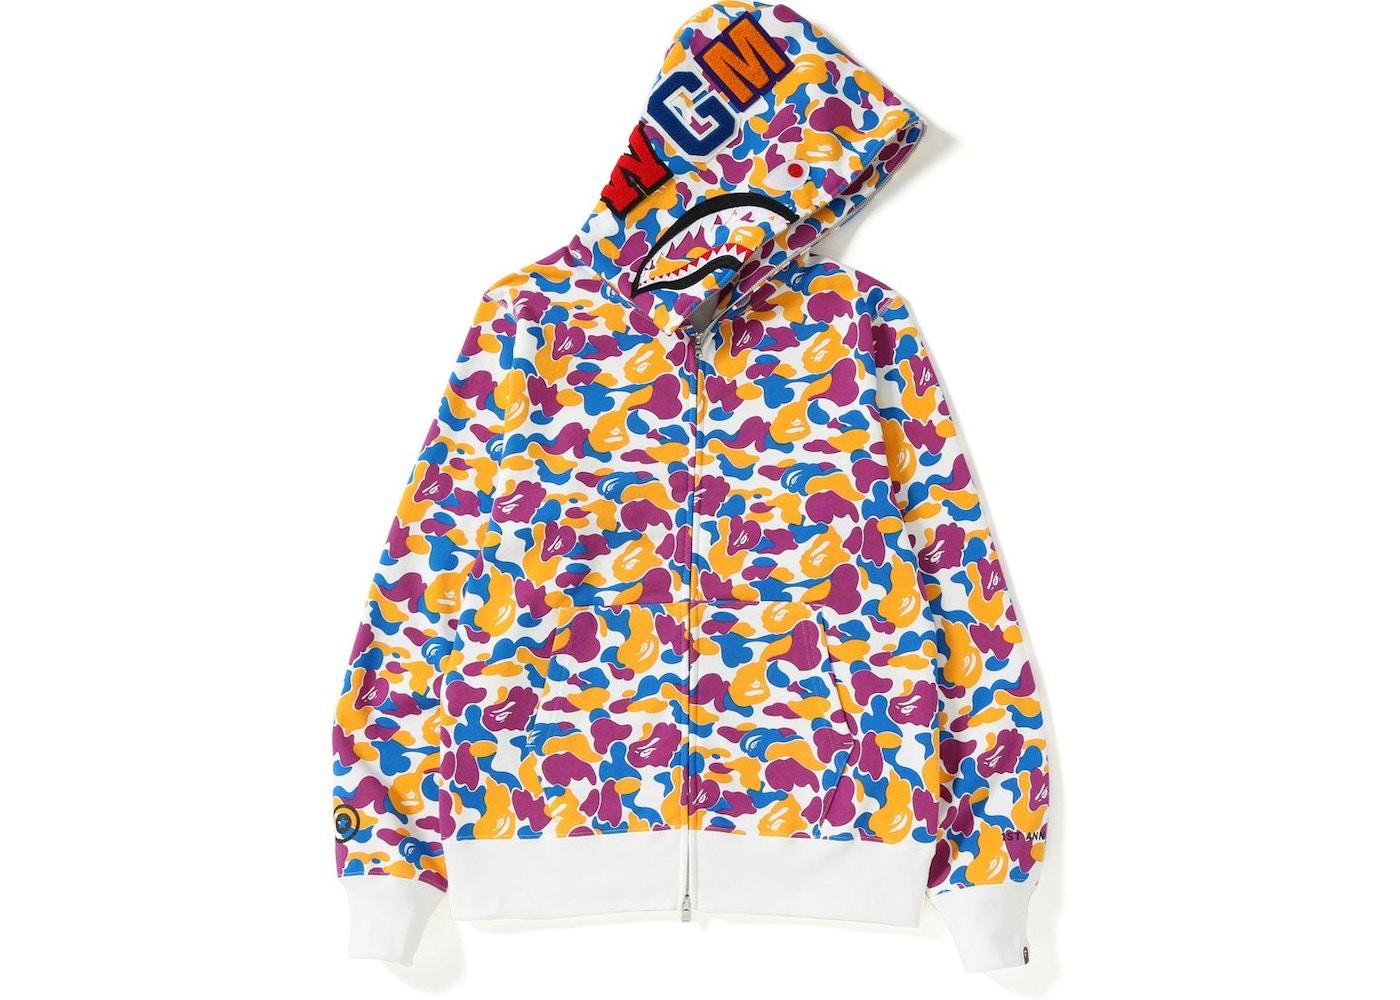 3cce698f Streetwear - Bape Tops/Sweatshirts - Highest Bid